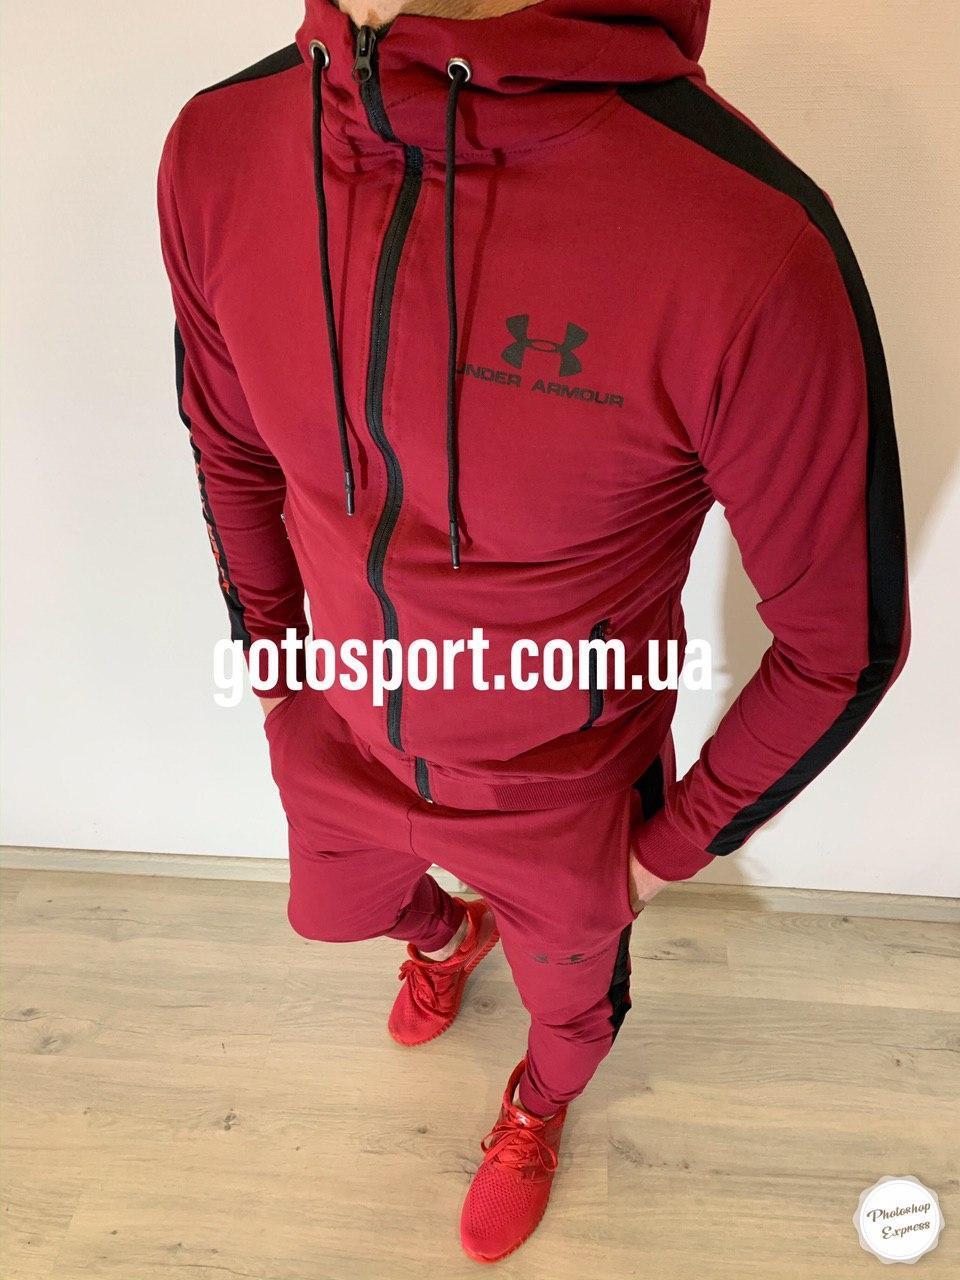 Мужской спортивный костюм Under Armour Bilberry Bordo